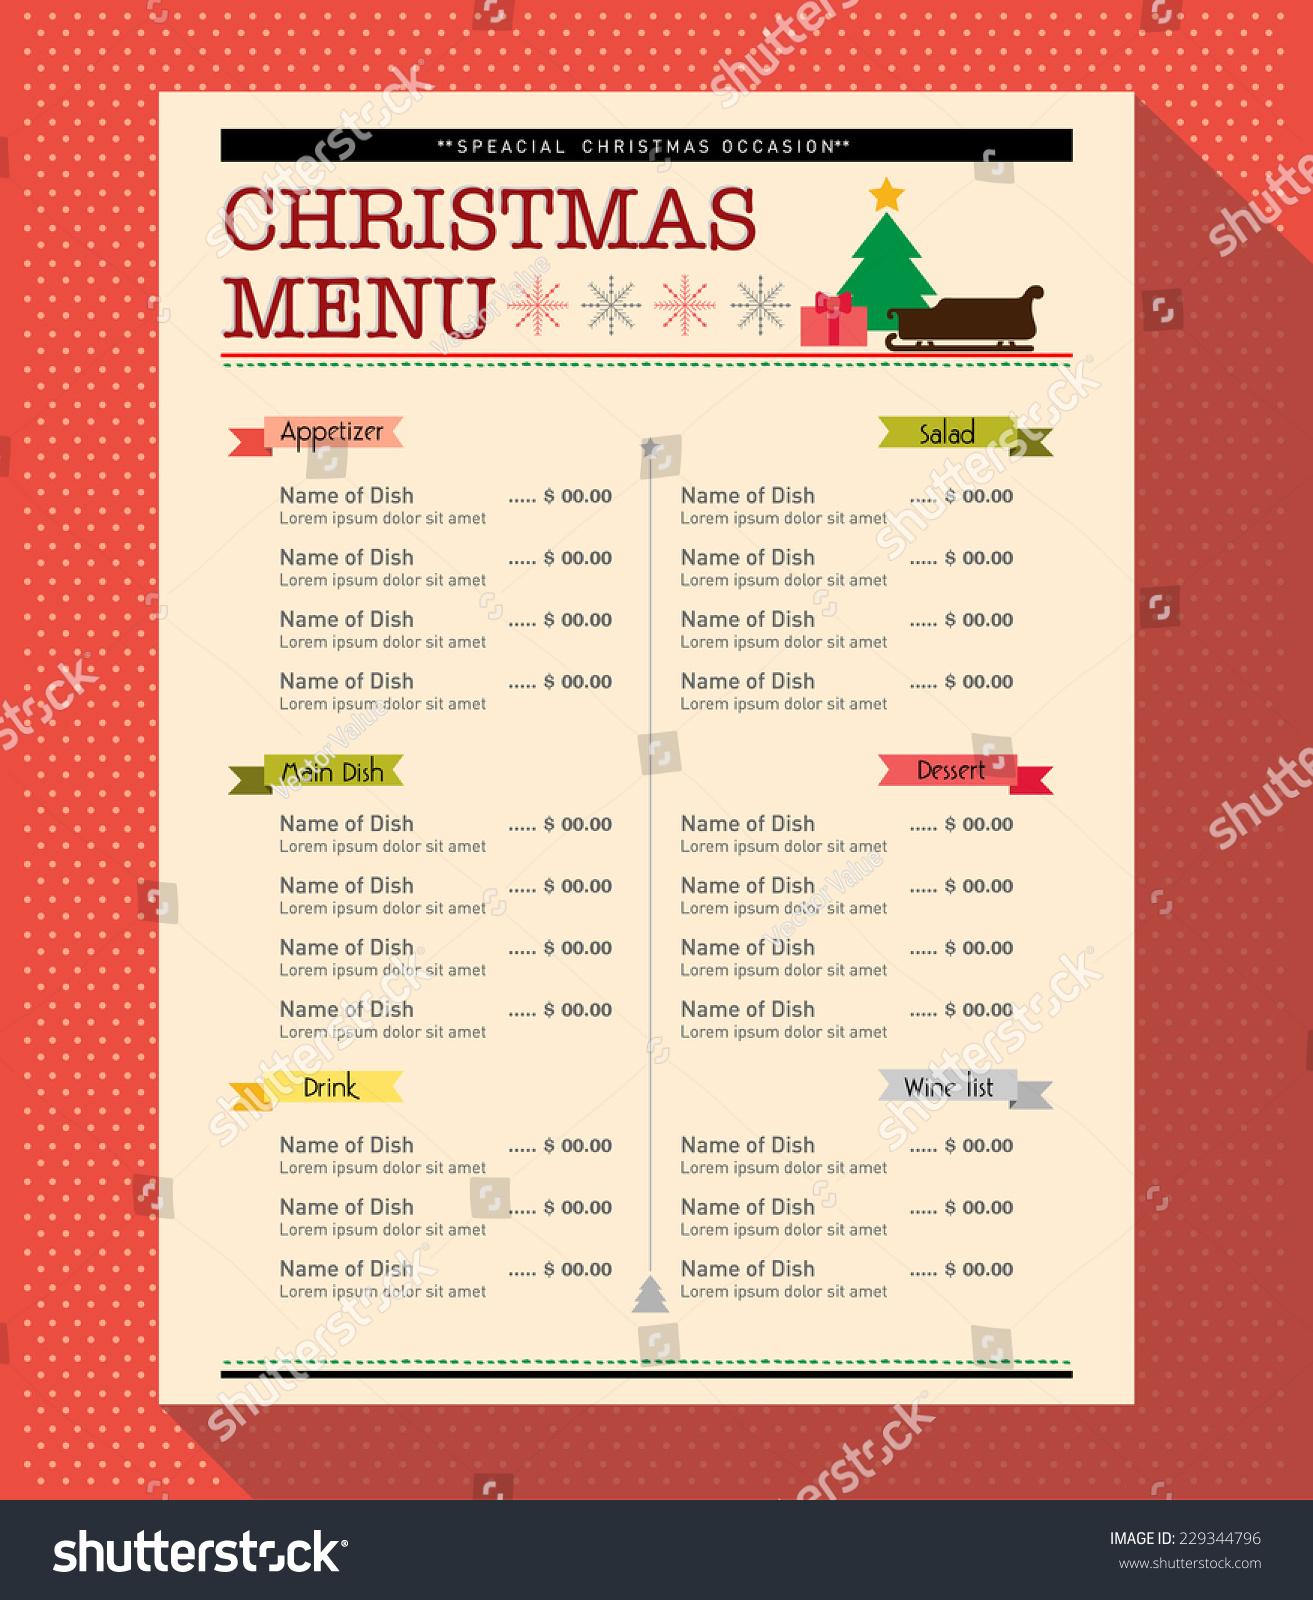 Christmas Menu Food Drink Design Template Stock Vector